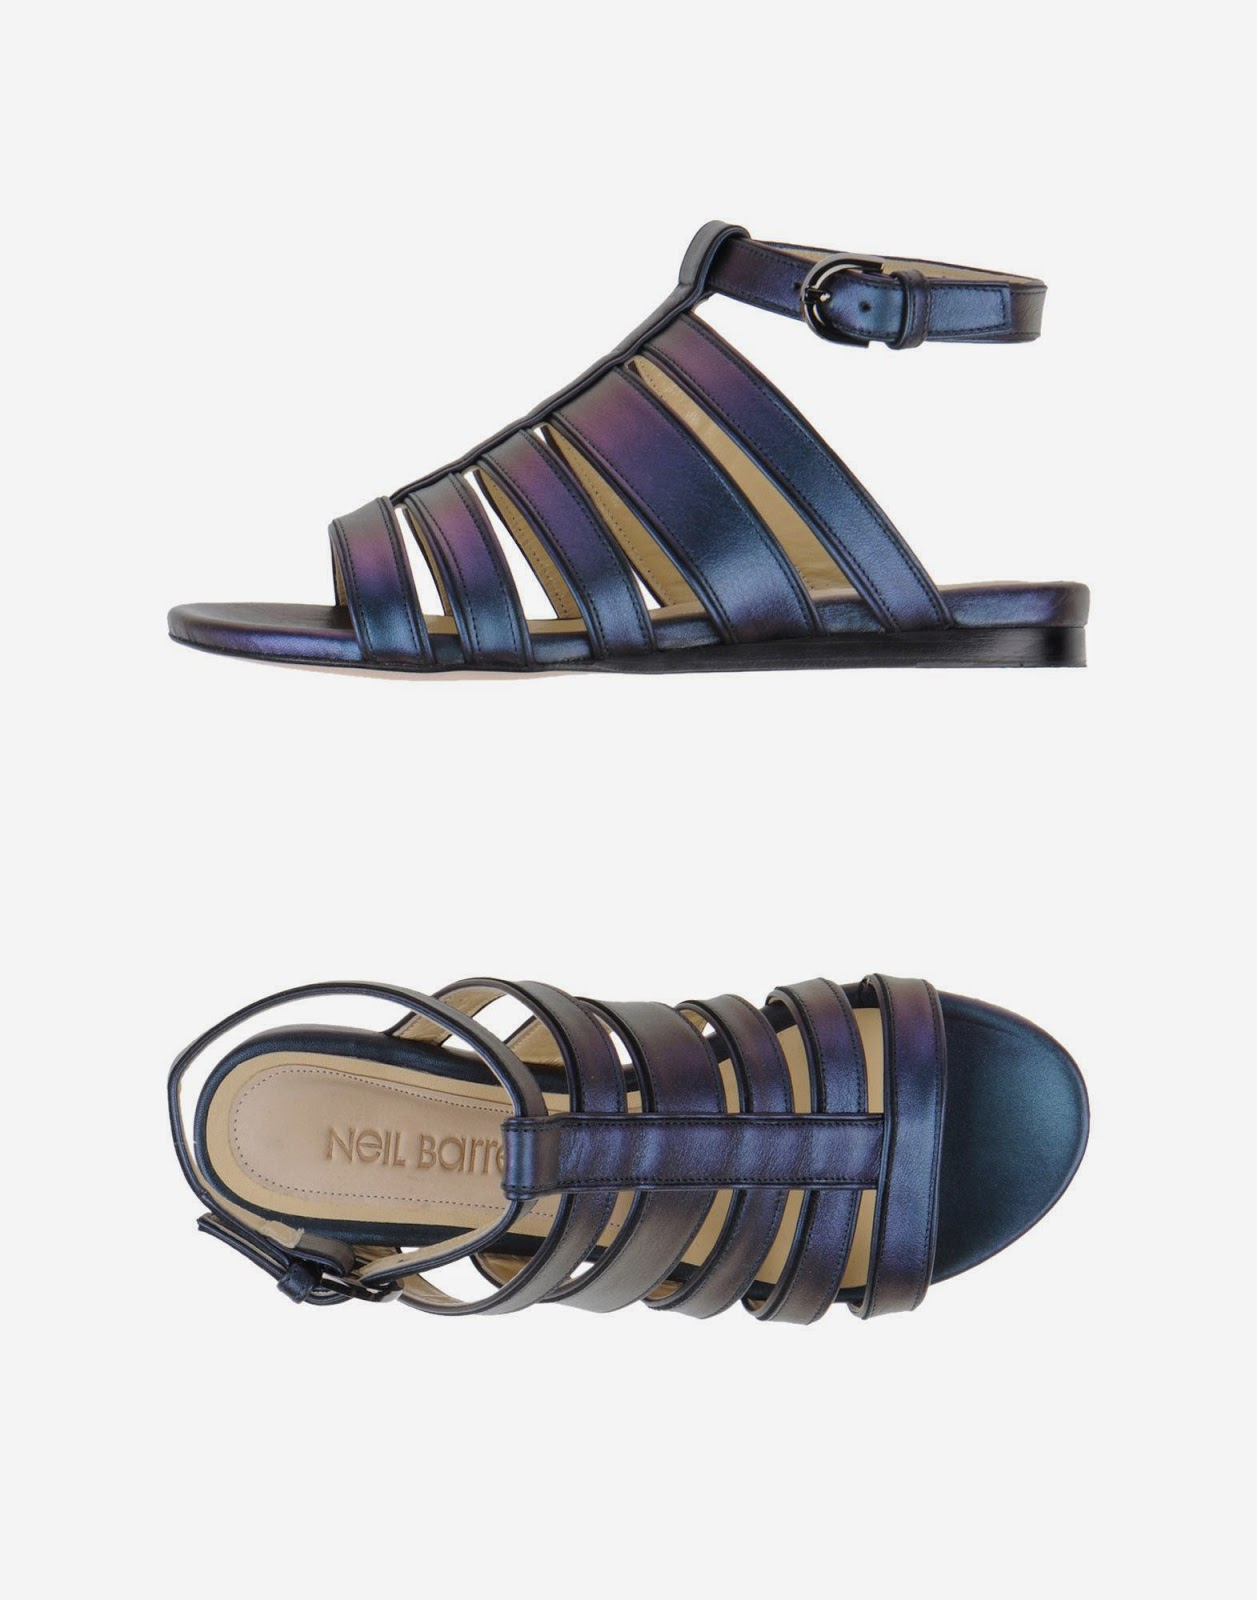 Neil Barrett strappy sandals